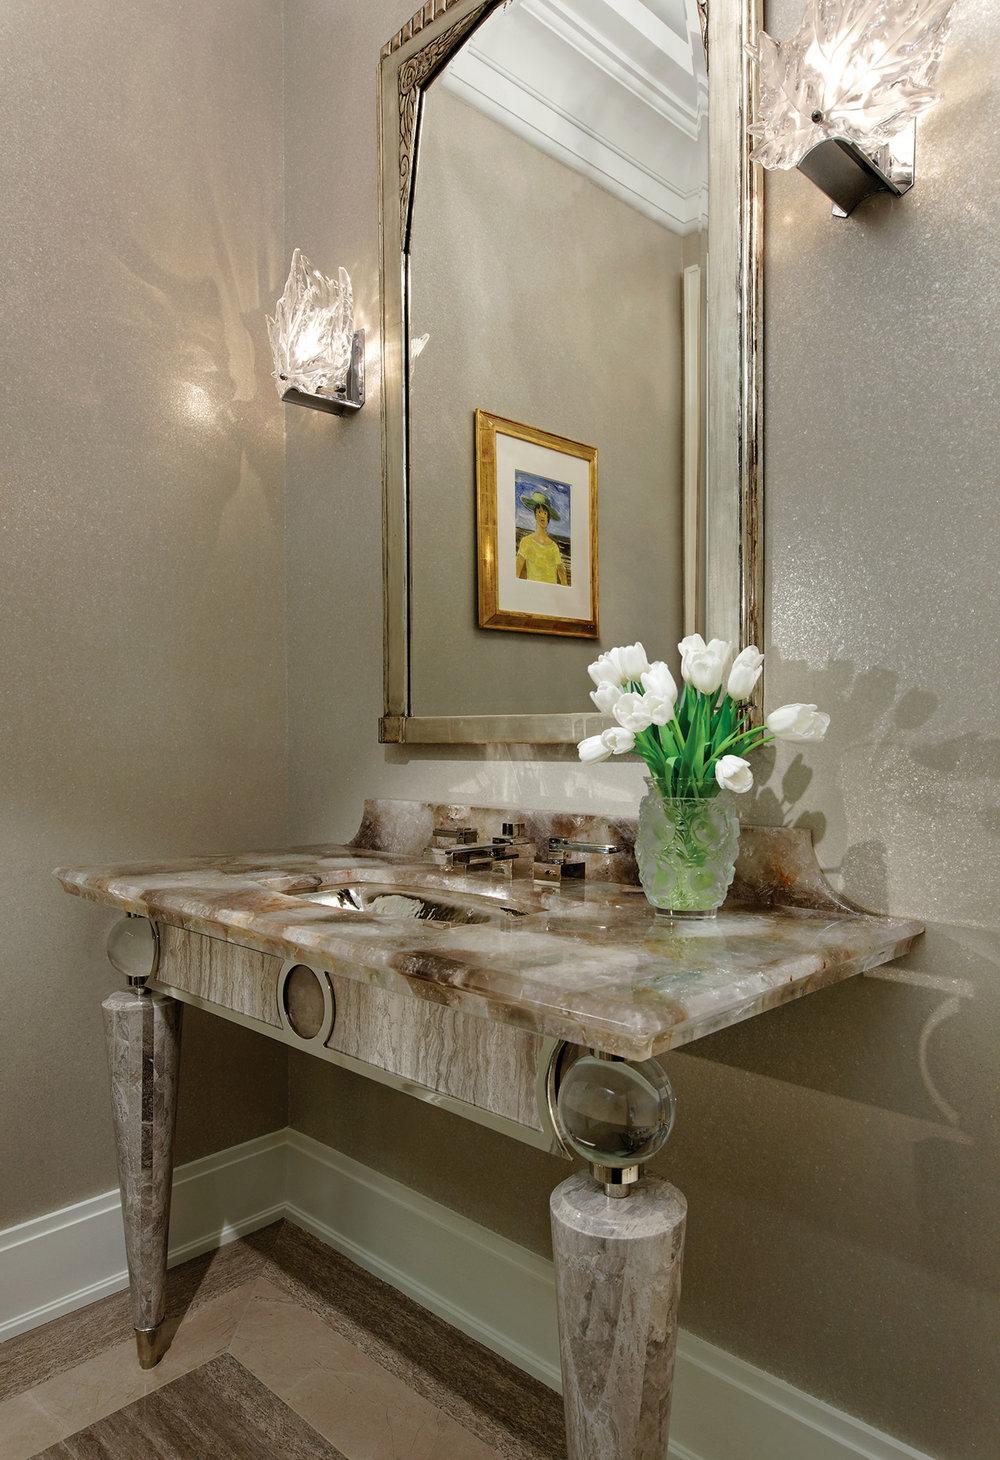 The semi-precious, semi-translucent quartz vanity that Douglas drew was a true challenge for the craftsmen, down to the custom shape of the edge's profile.